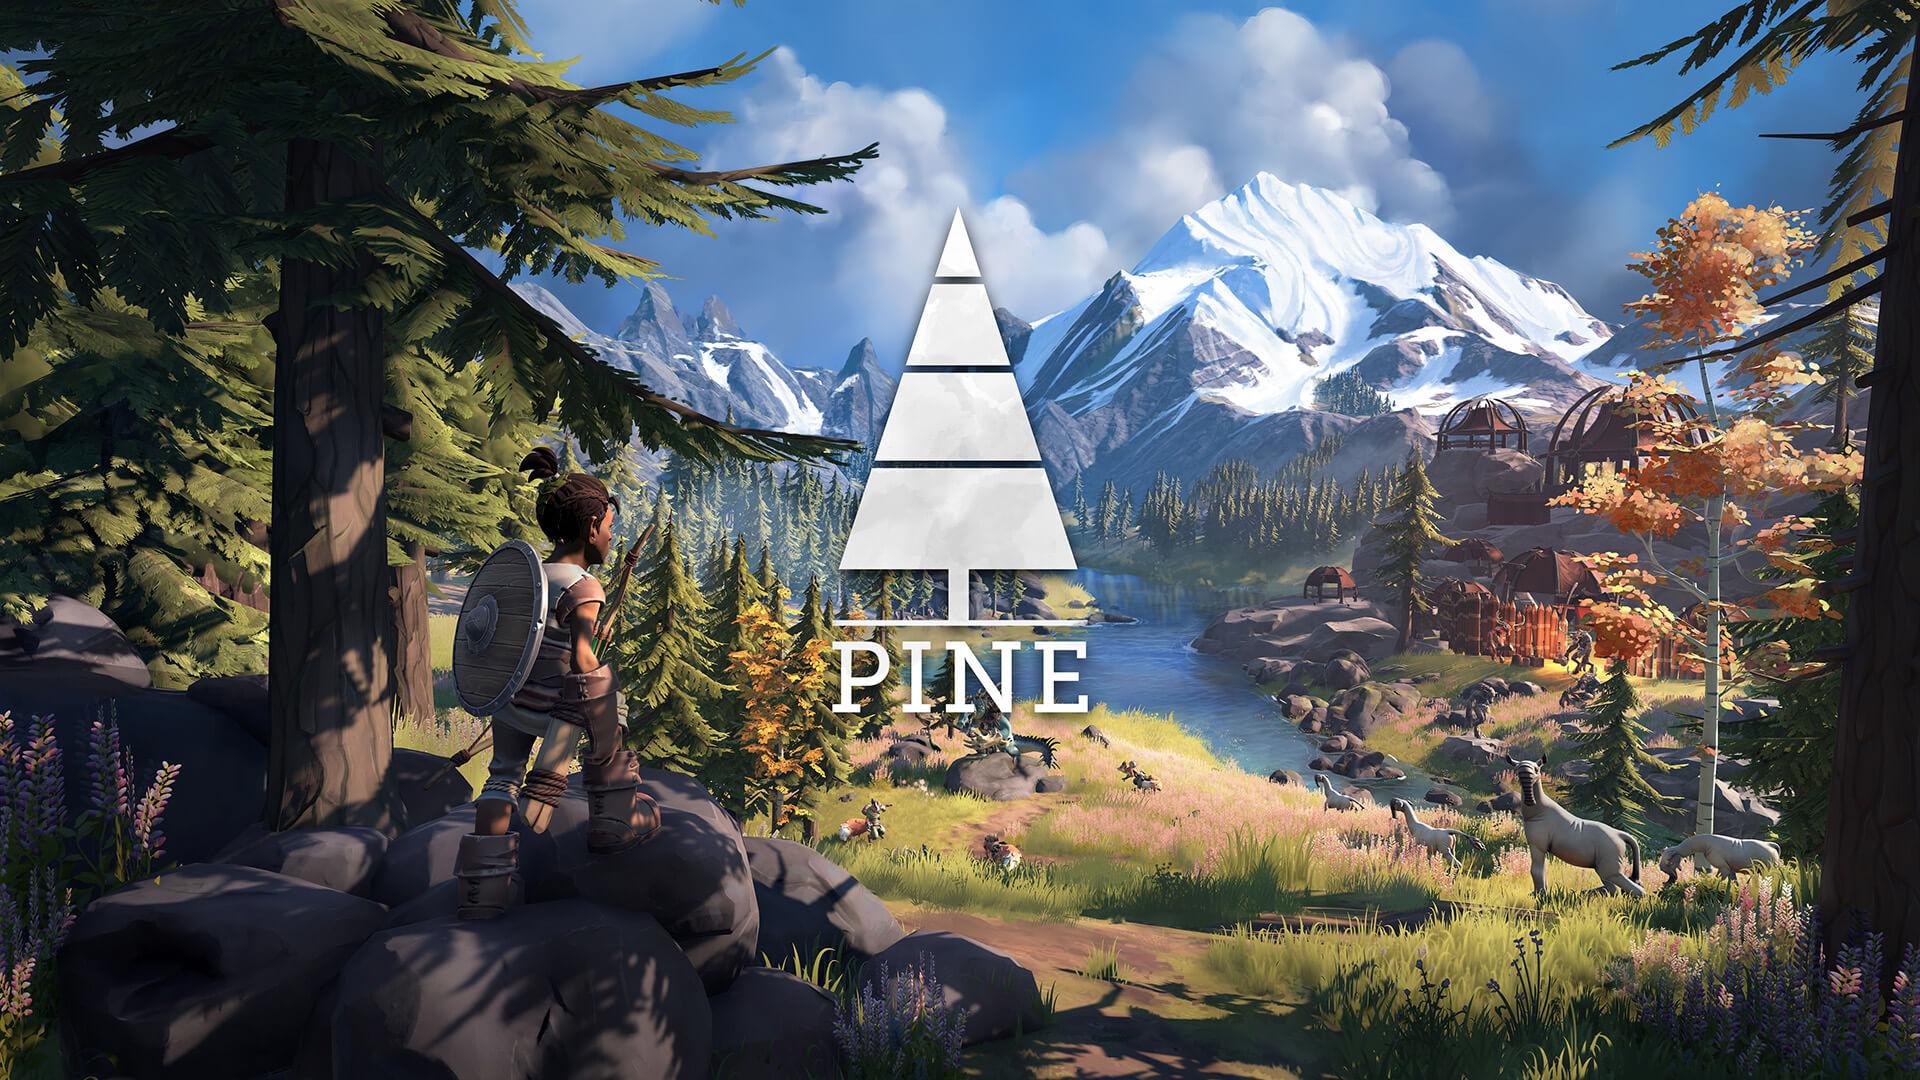 В Epic Games Store бесплатно раздают приключенческий экшен Pine - ITC.ua